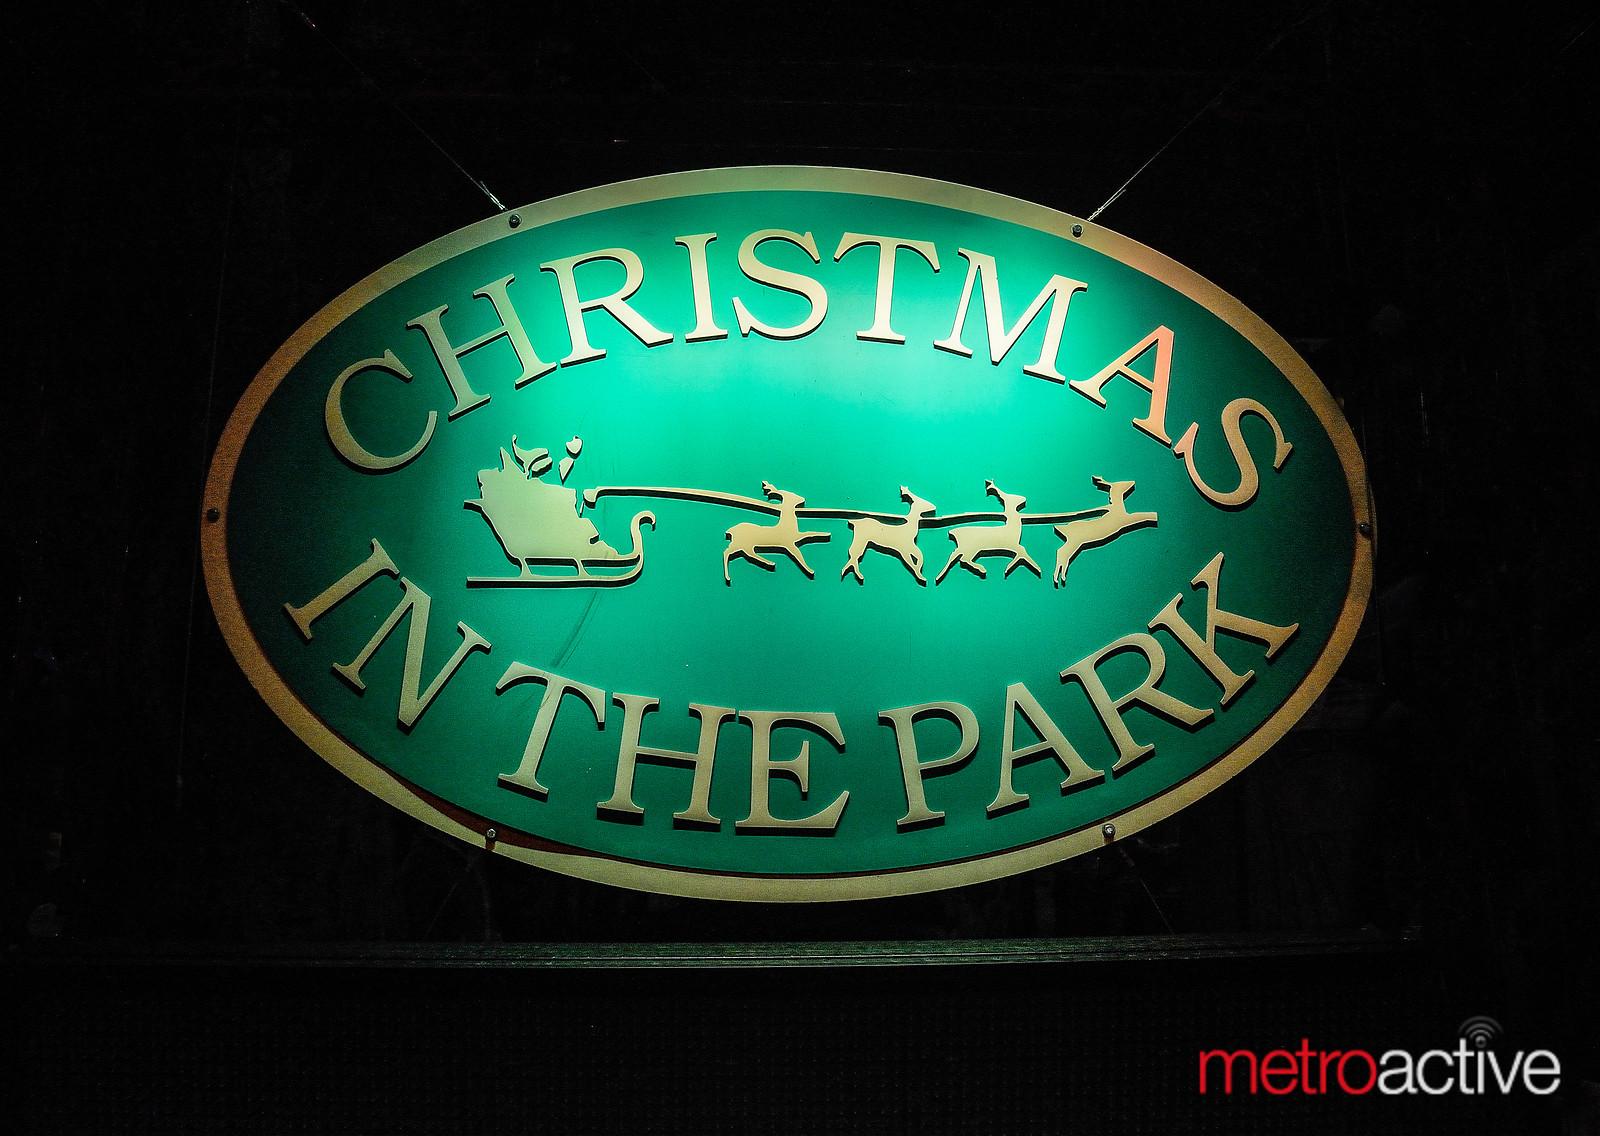 ChristmasInTheParkSign